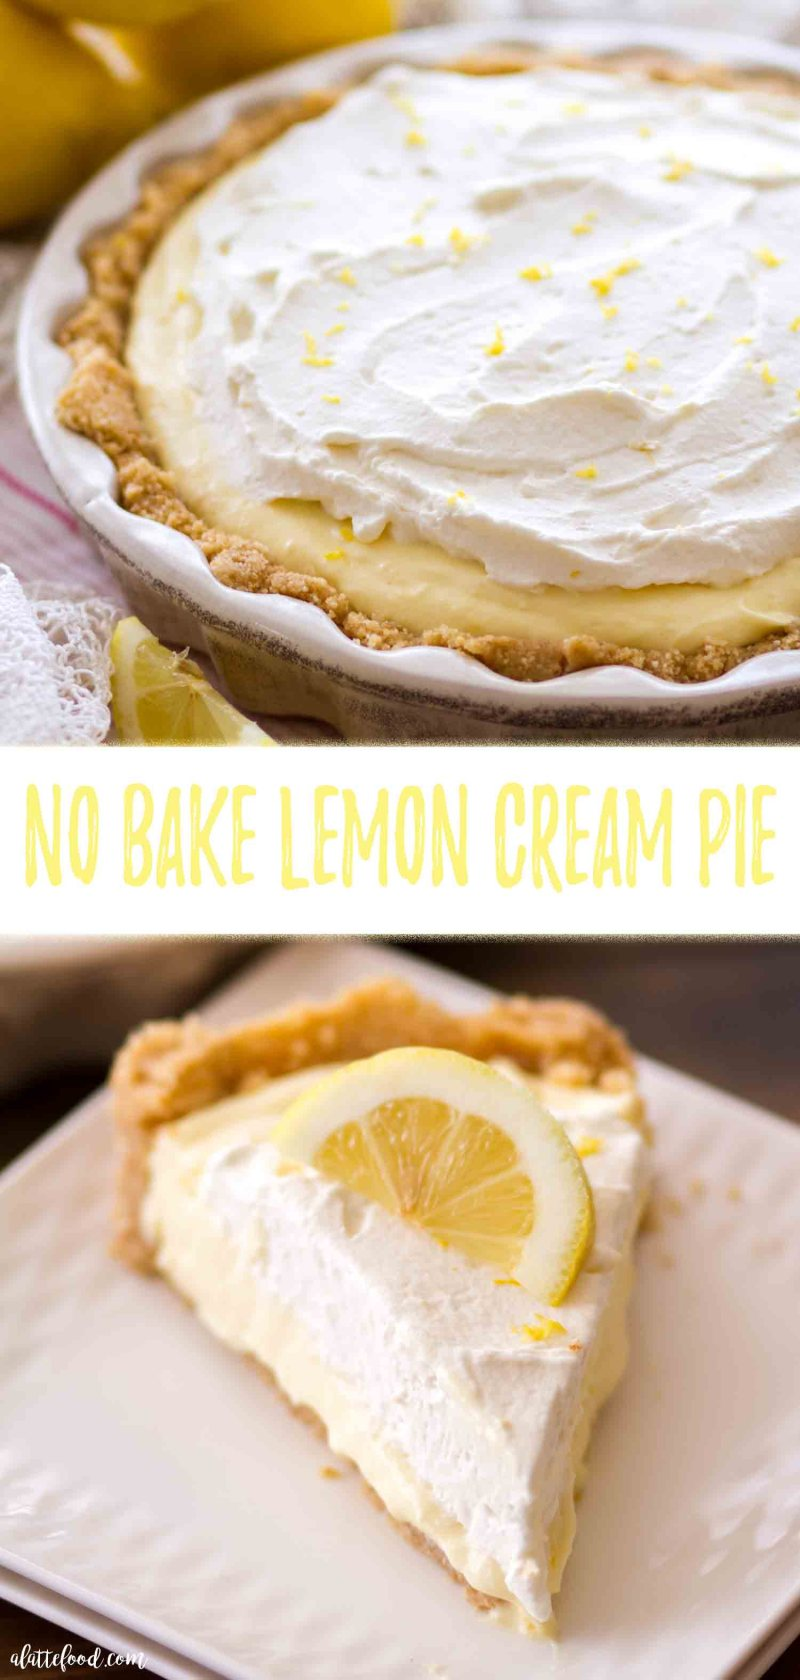 No Bake Lemon Cream Pie with a nilla wafer crust (vanilla wafer crust) and homemade lemon whipped cream.